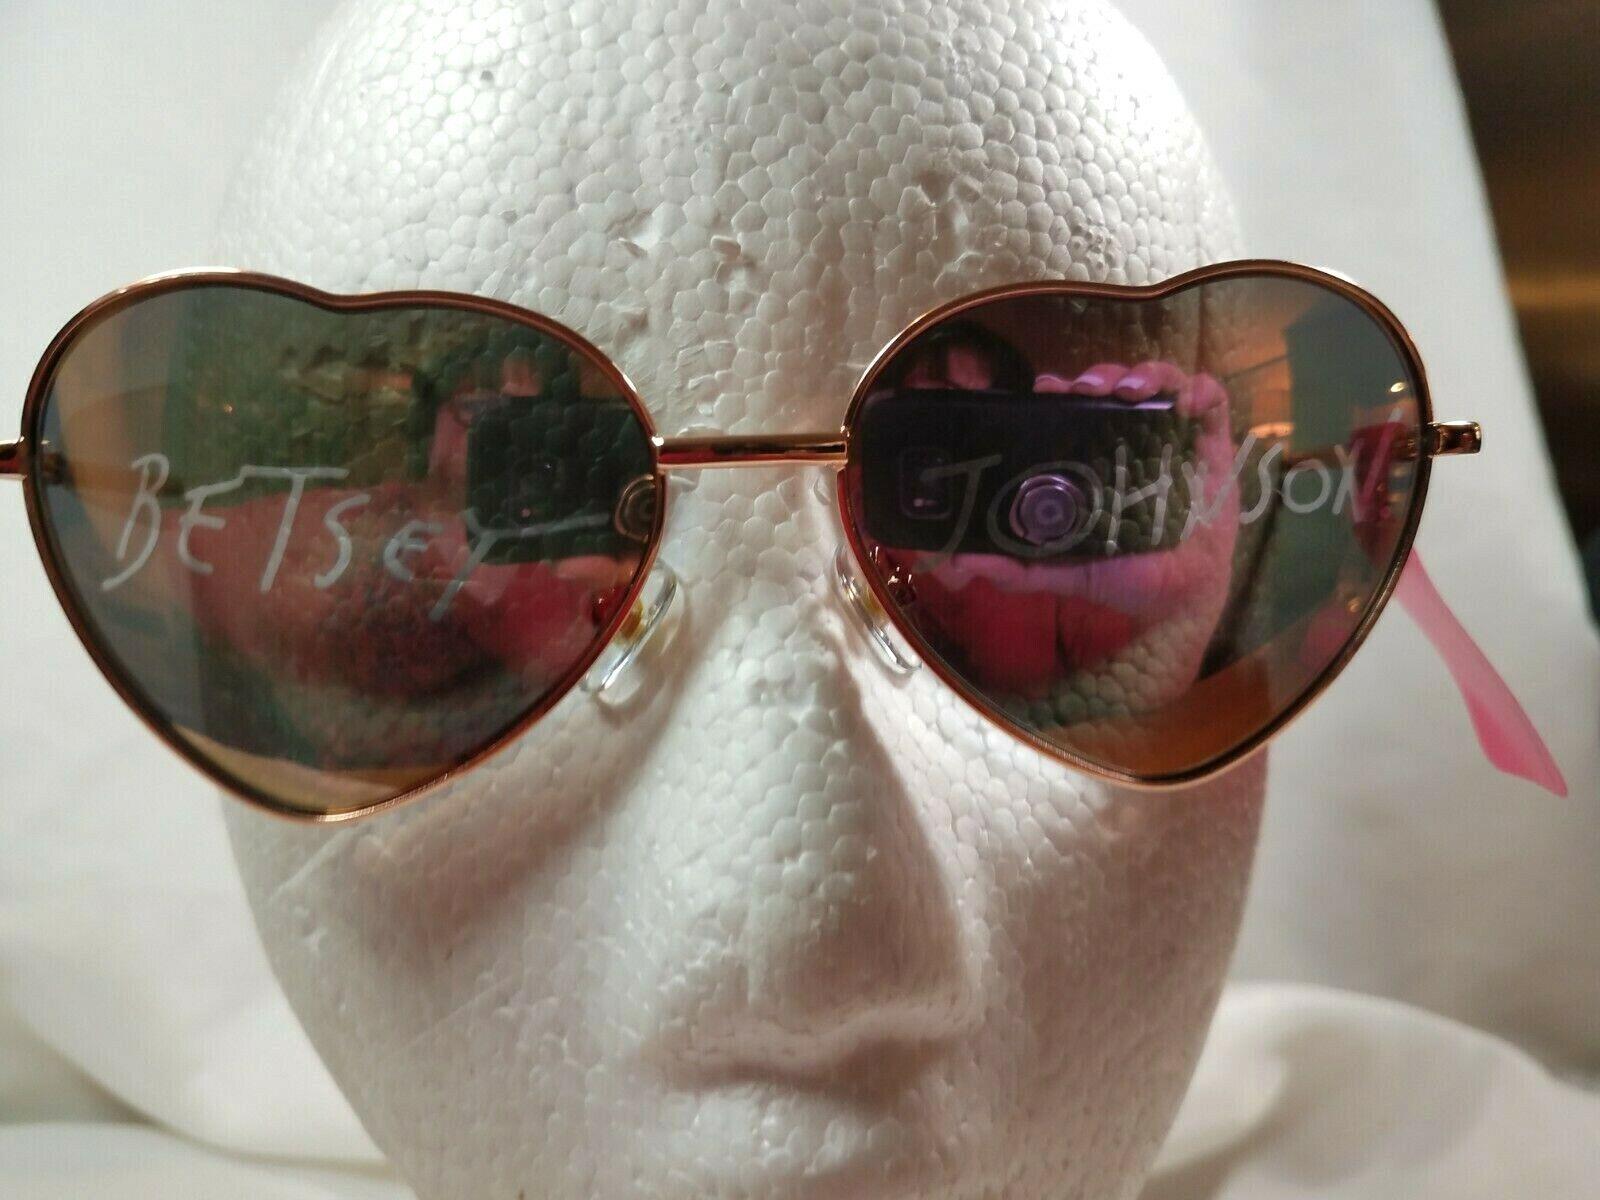 NWT Betsey Johnson Heart Aviator Style Sunglasses Rose Gold